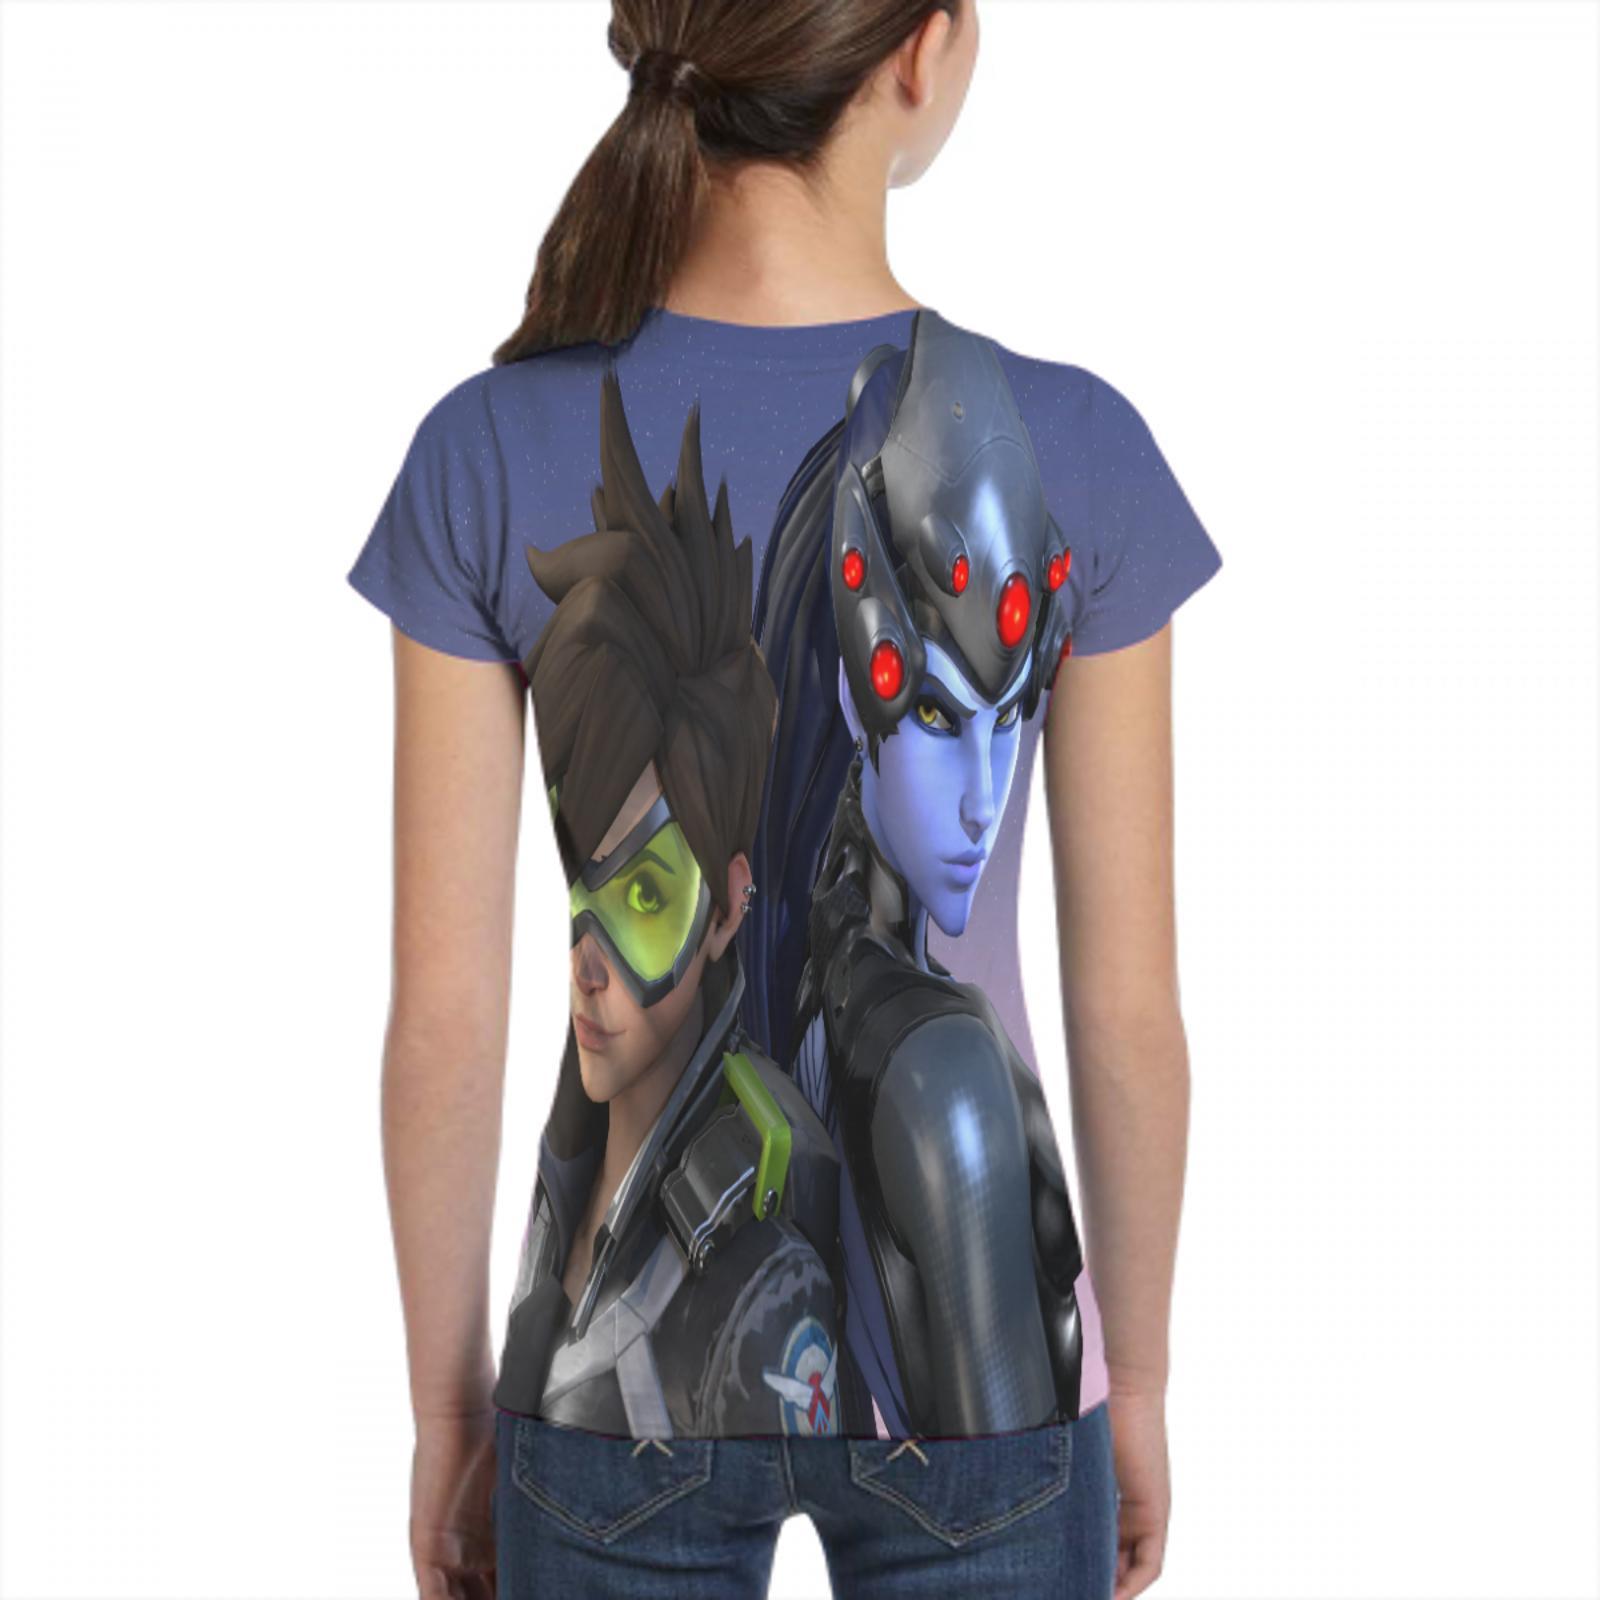 printer overwatch top t shirt gothic female/male black t shirt overwatch socks female/male t shirt 3